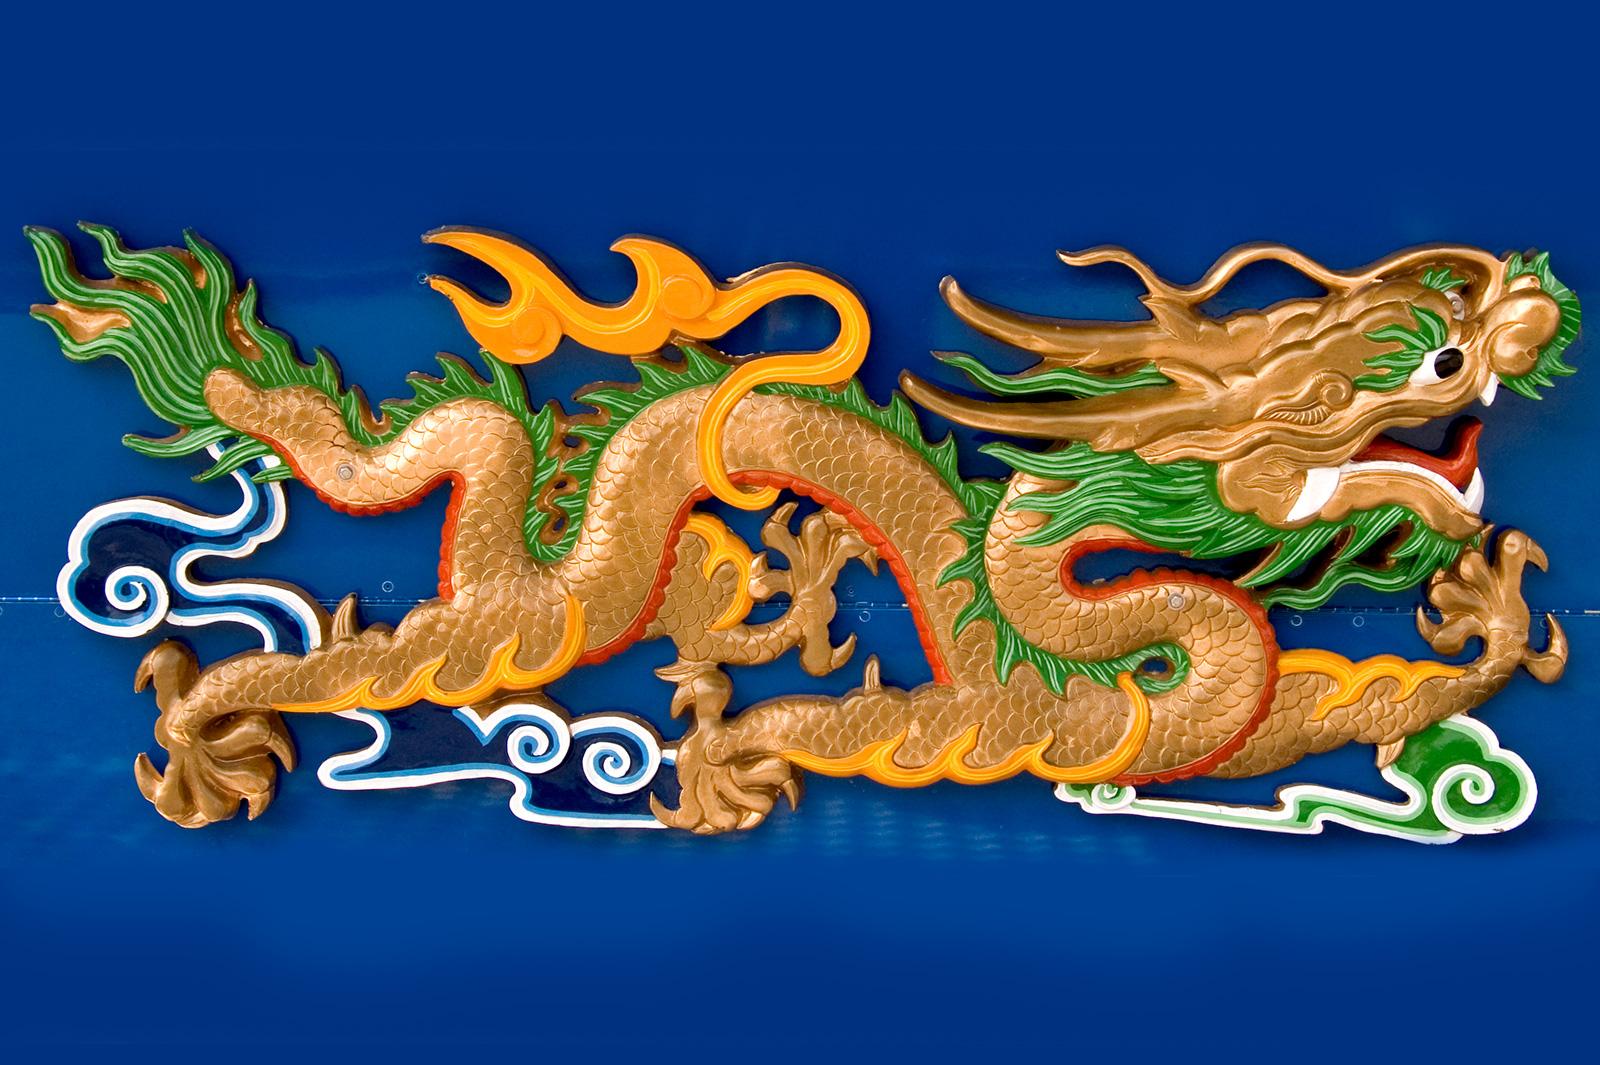 dragon-en-azul.jpg